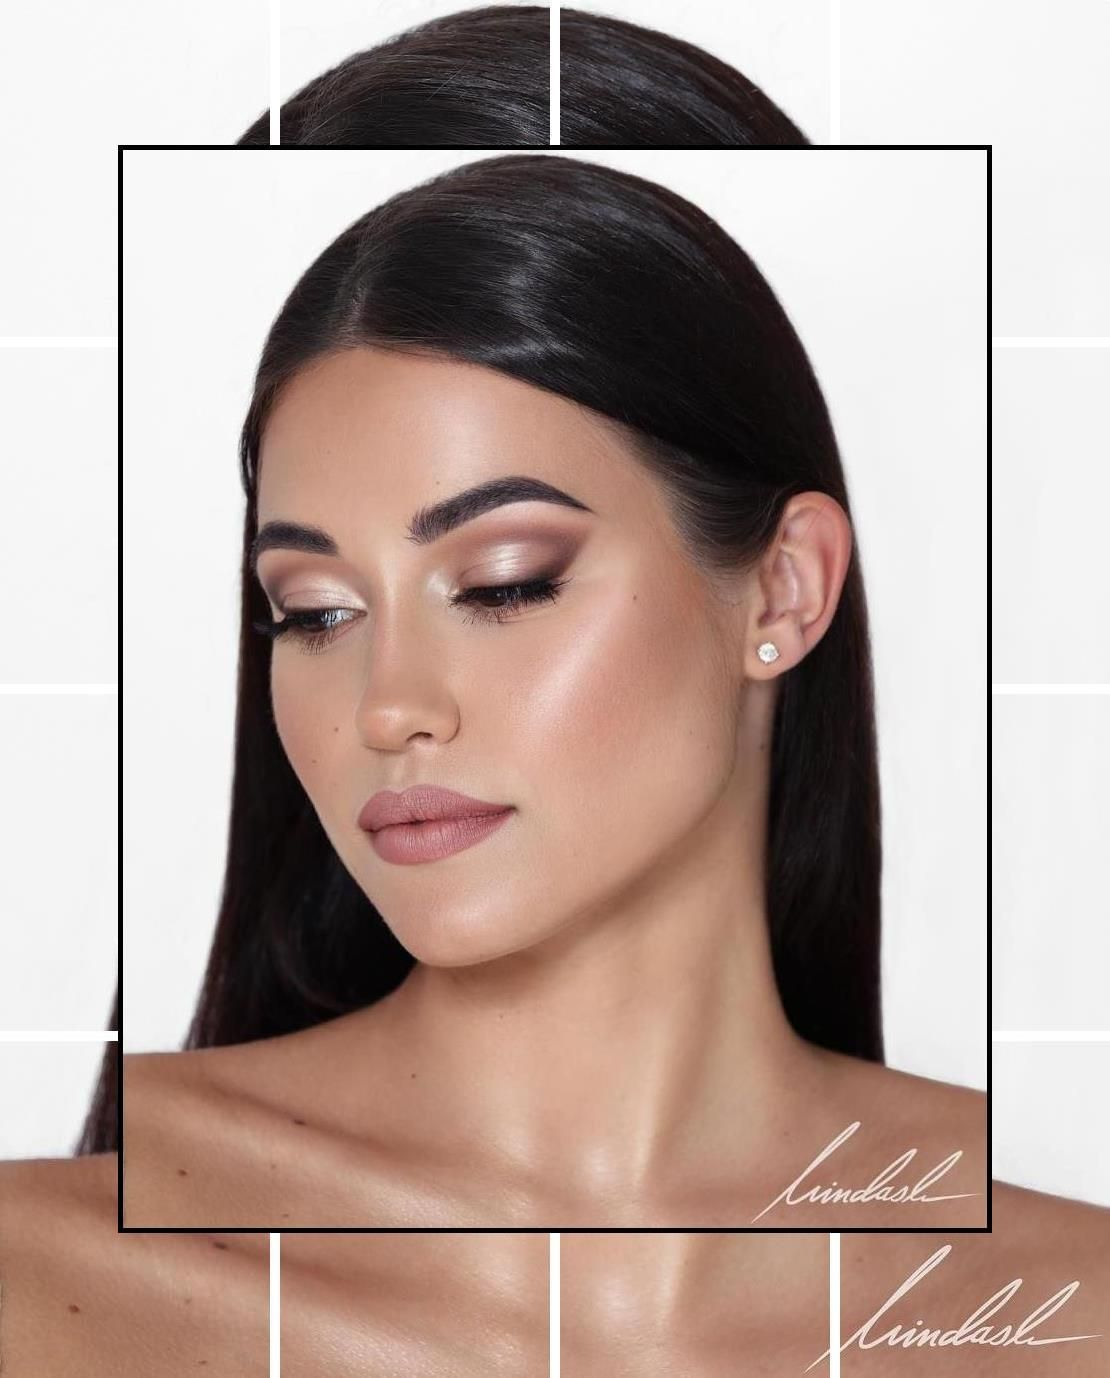 Best Eyebrow Makeup Kit Eyebrow Waxing Near Me How To